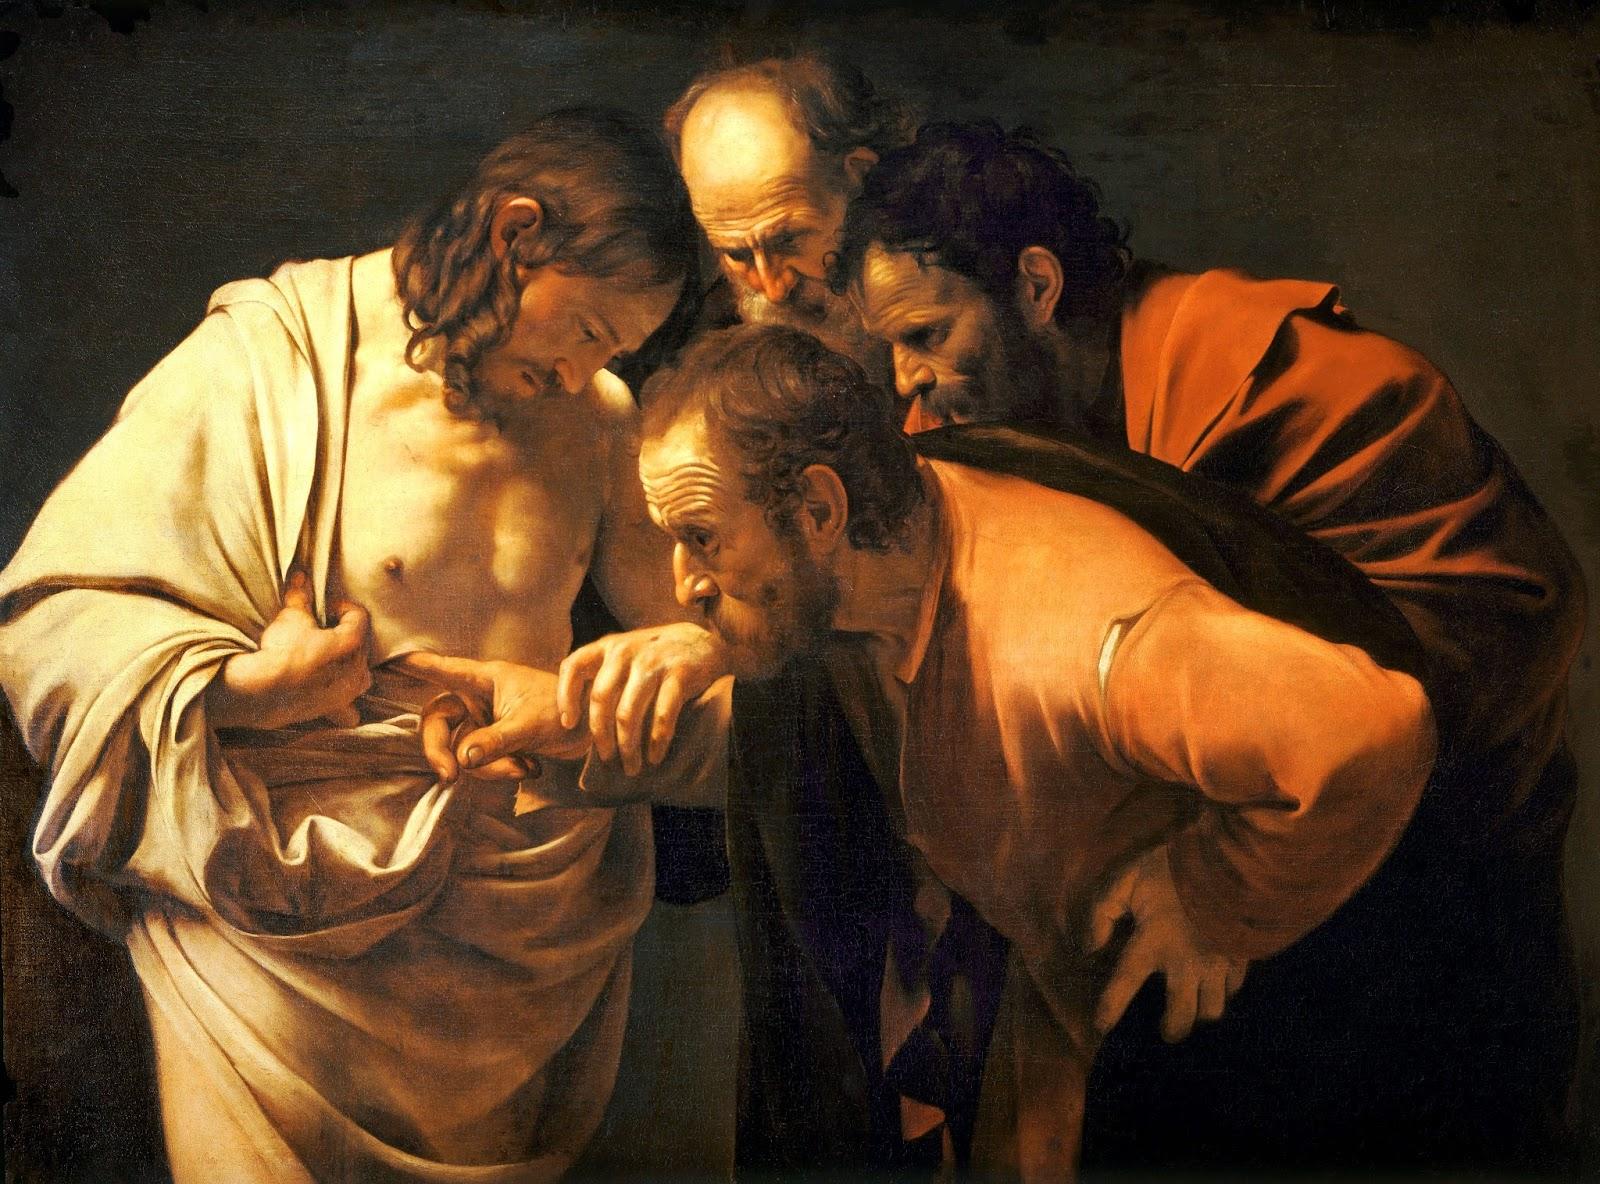 7ec0d-the_incredulity_of_saint_thomas-caravaggio_1601-2